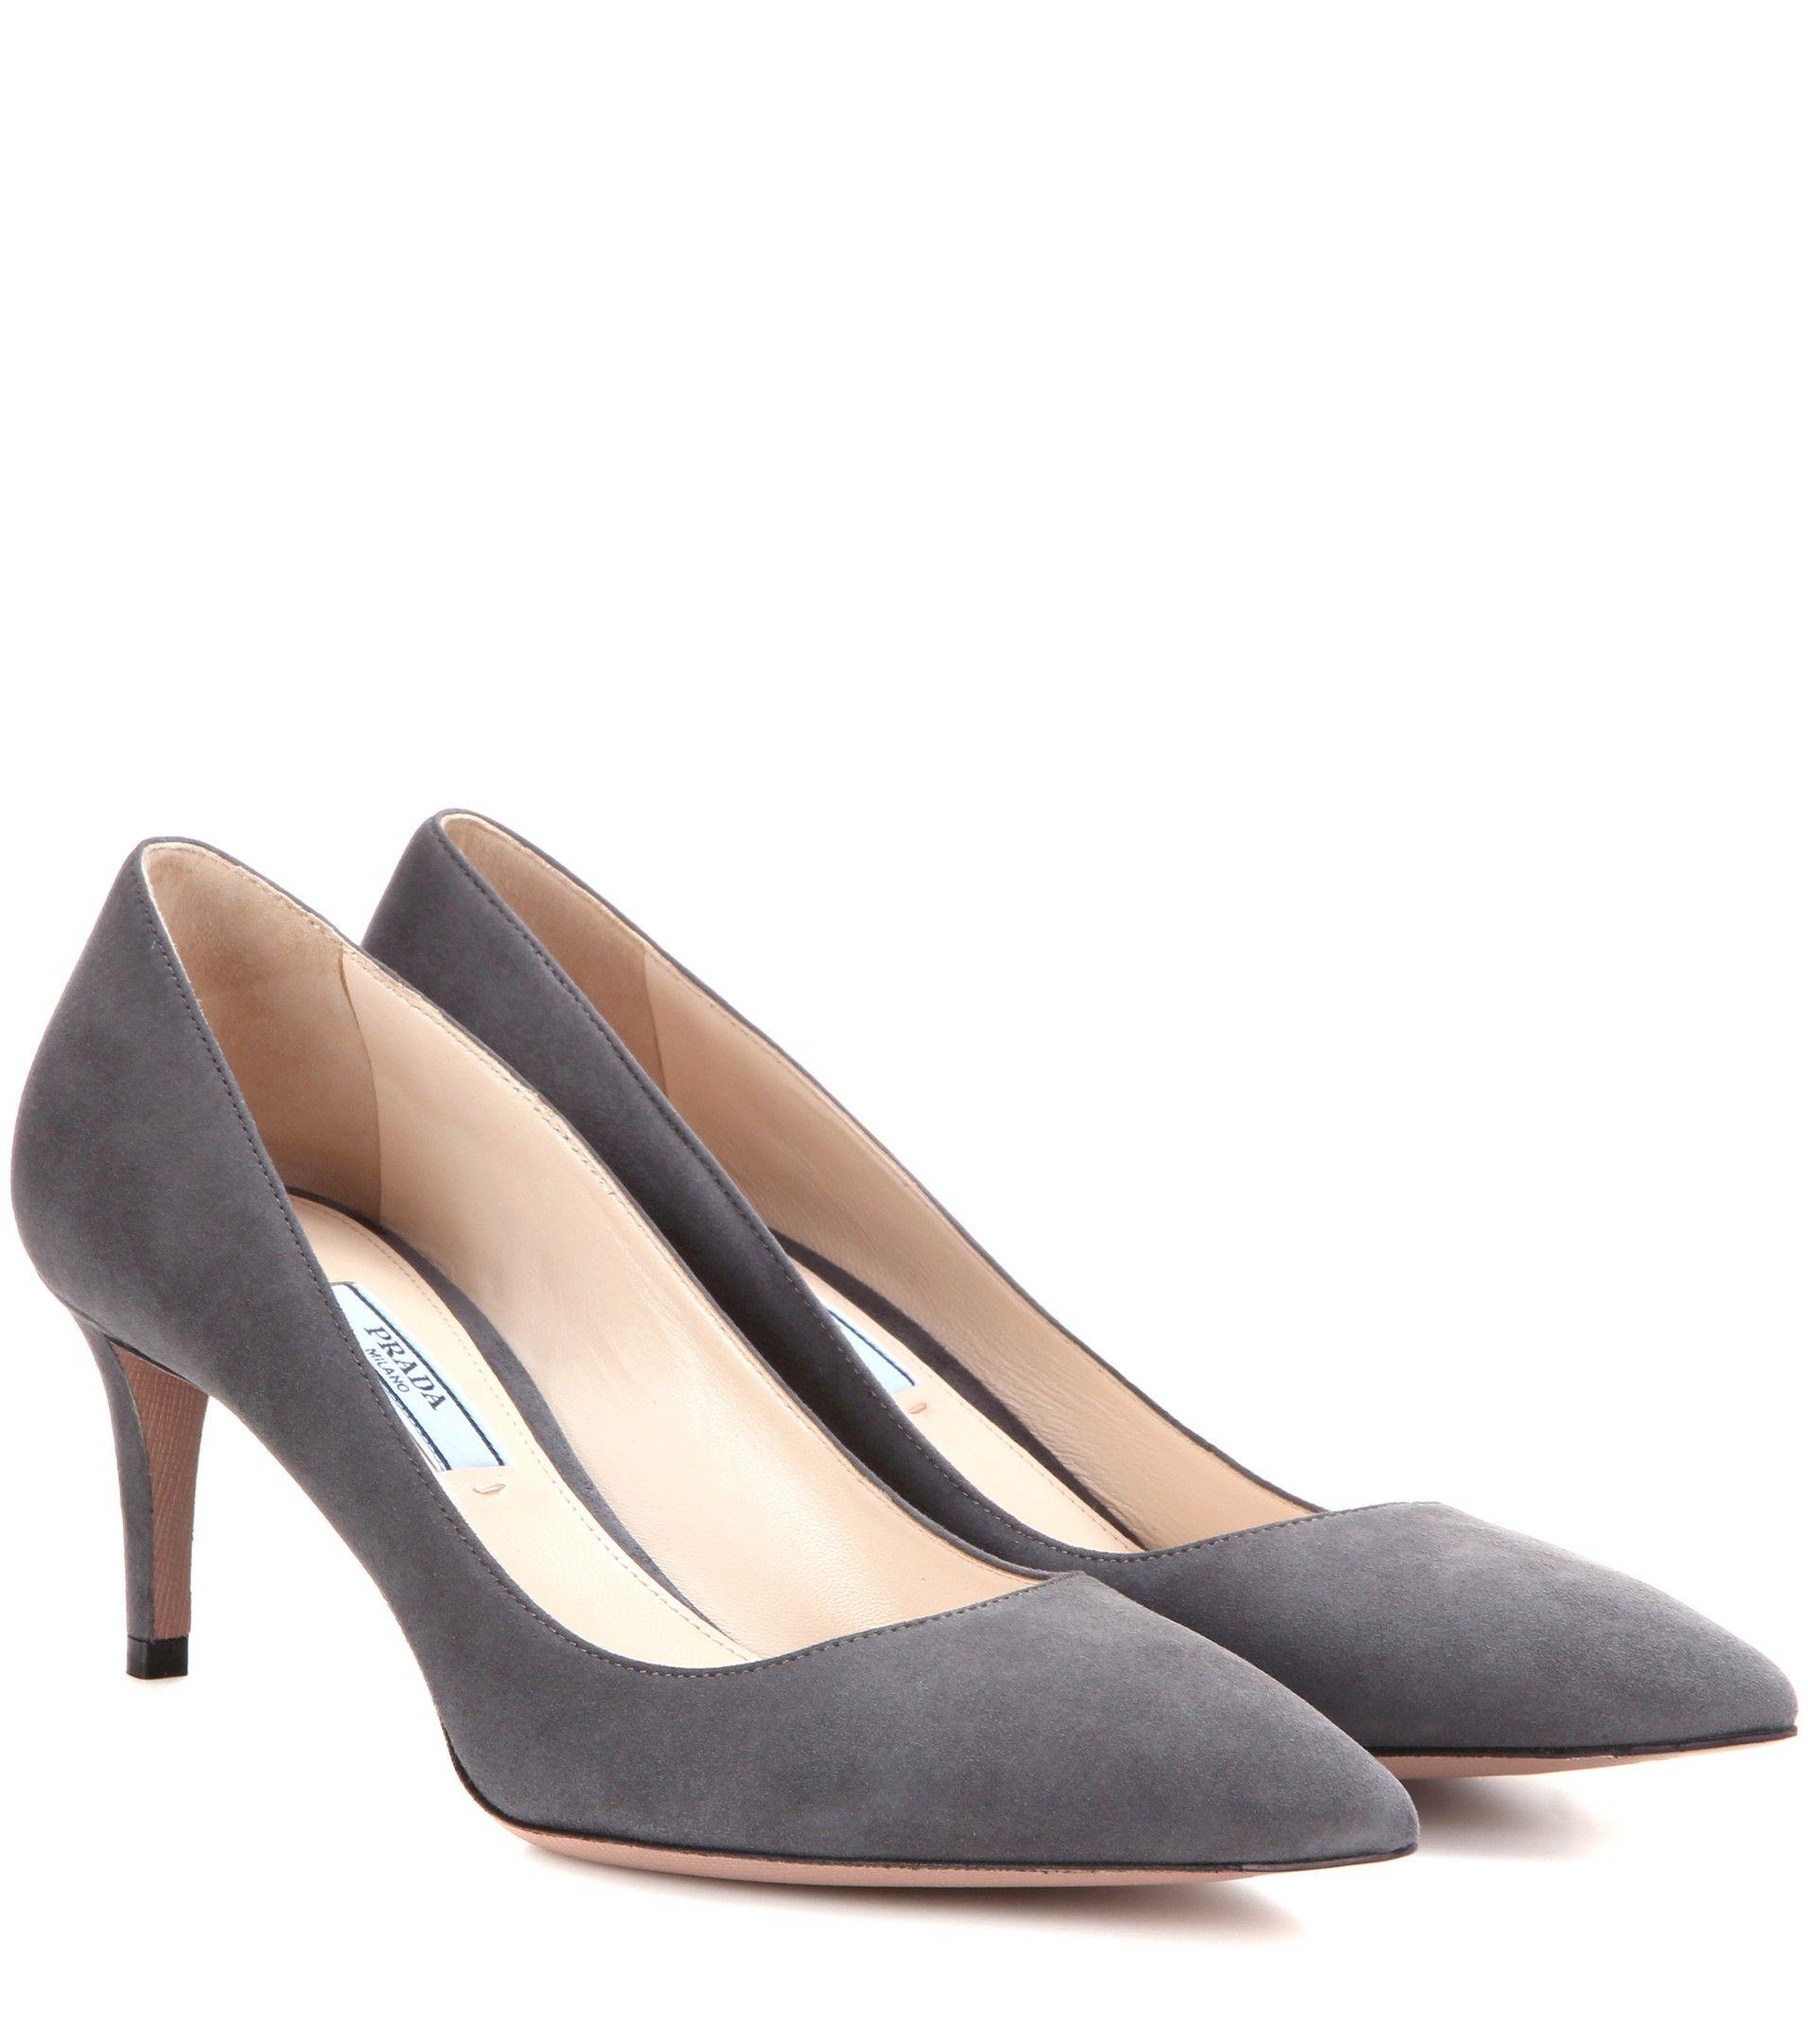 Prada Suede kitten-heel pumps Gray | Fashion | Pinterest | Kitten ...